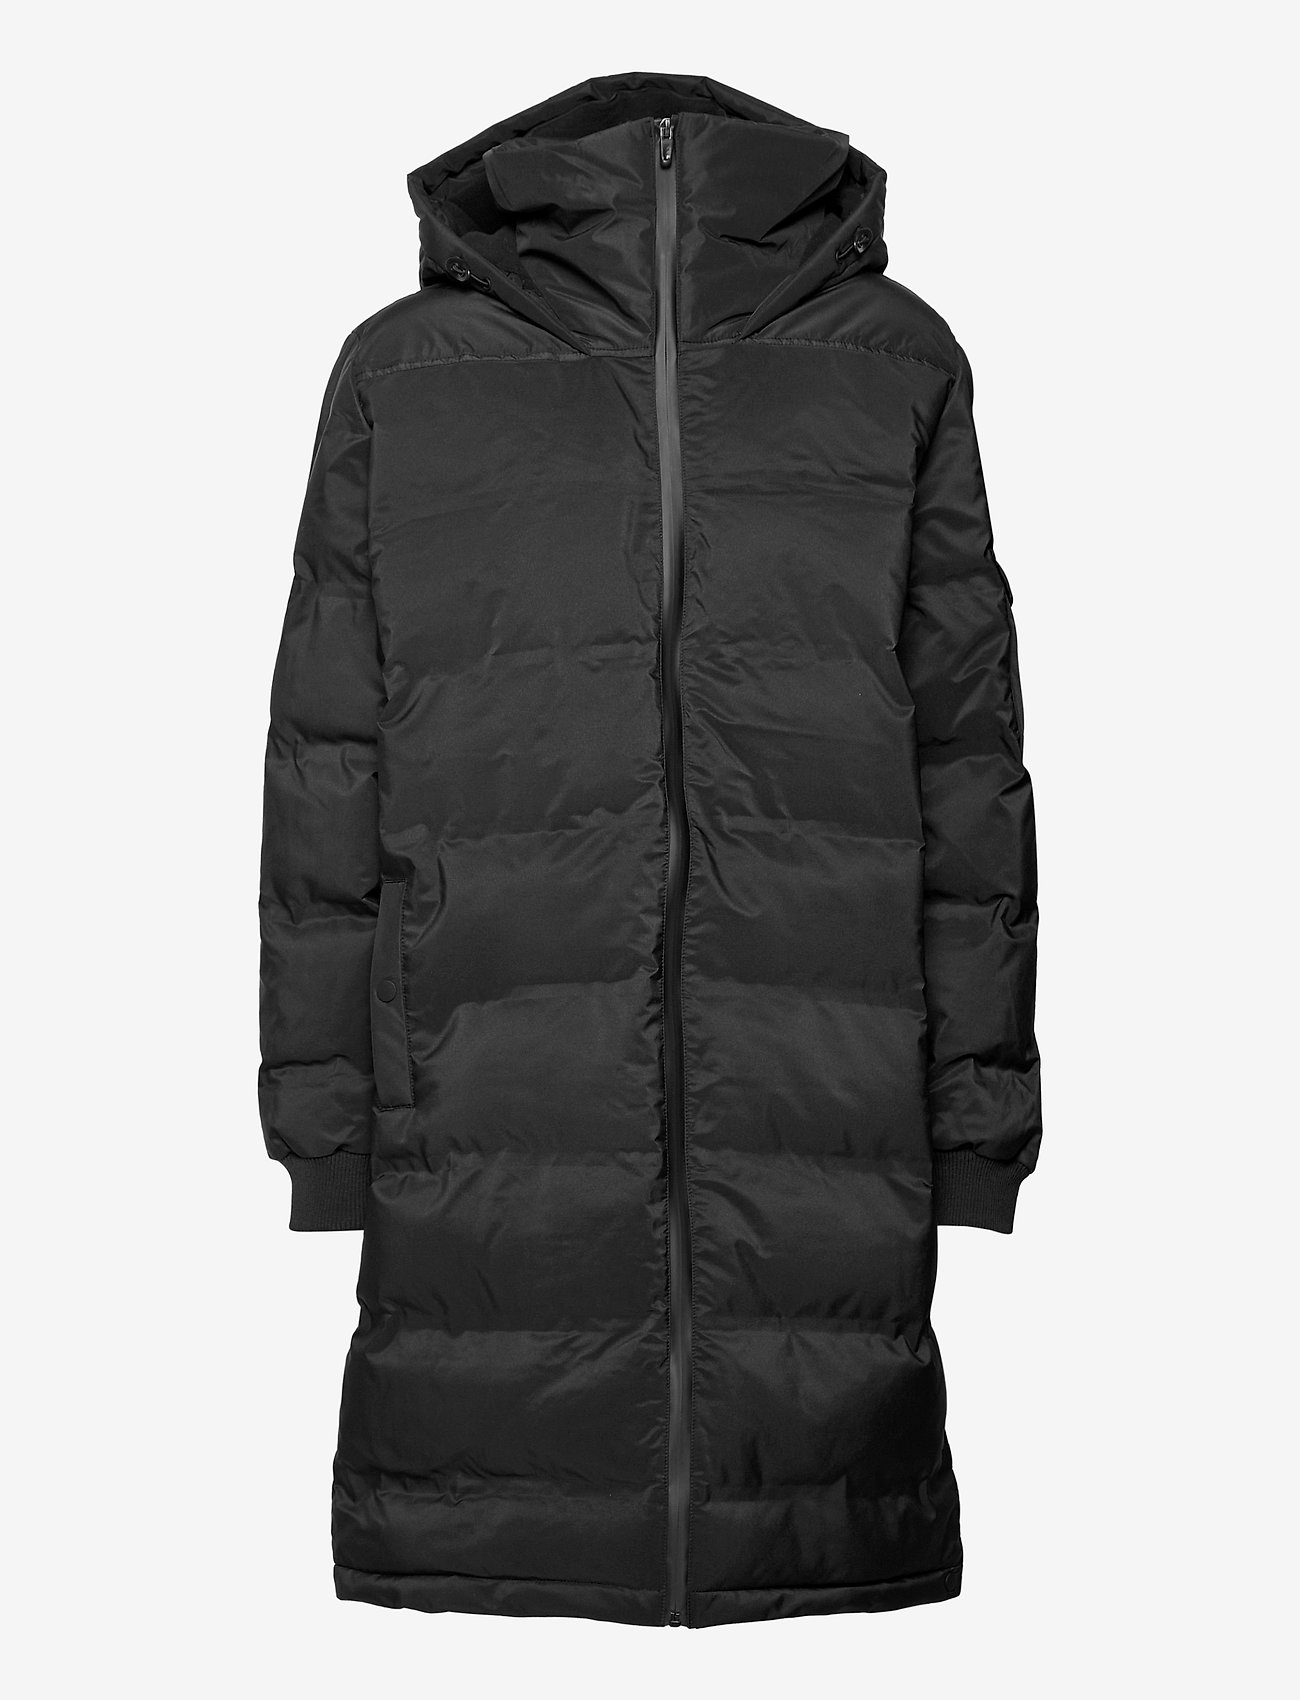 Hummel - hmlCOLUMBO JACKET - sports jackets - black - 1